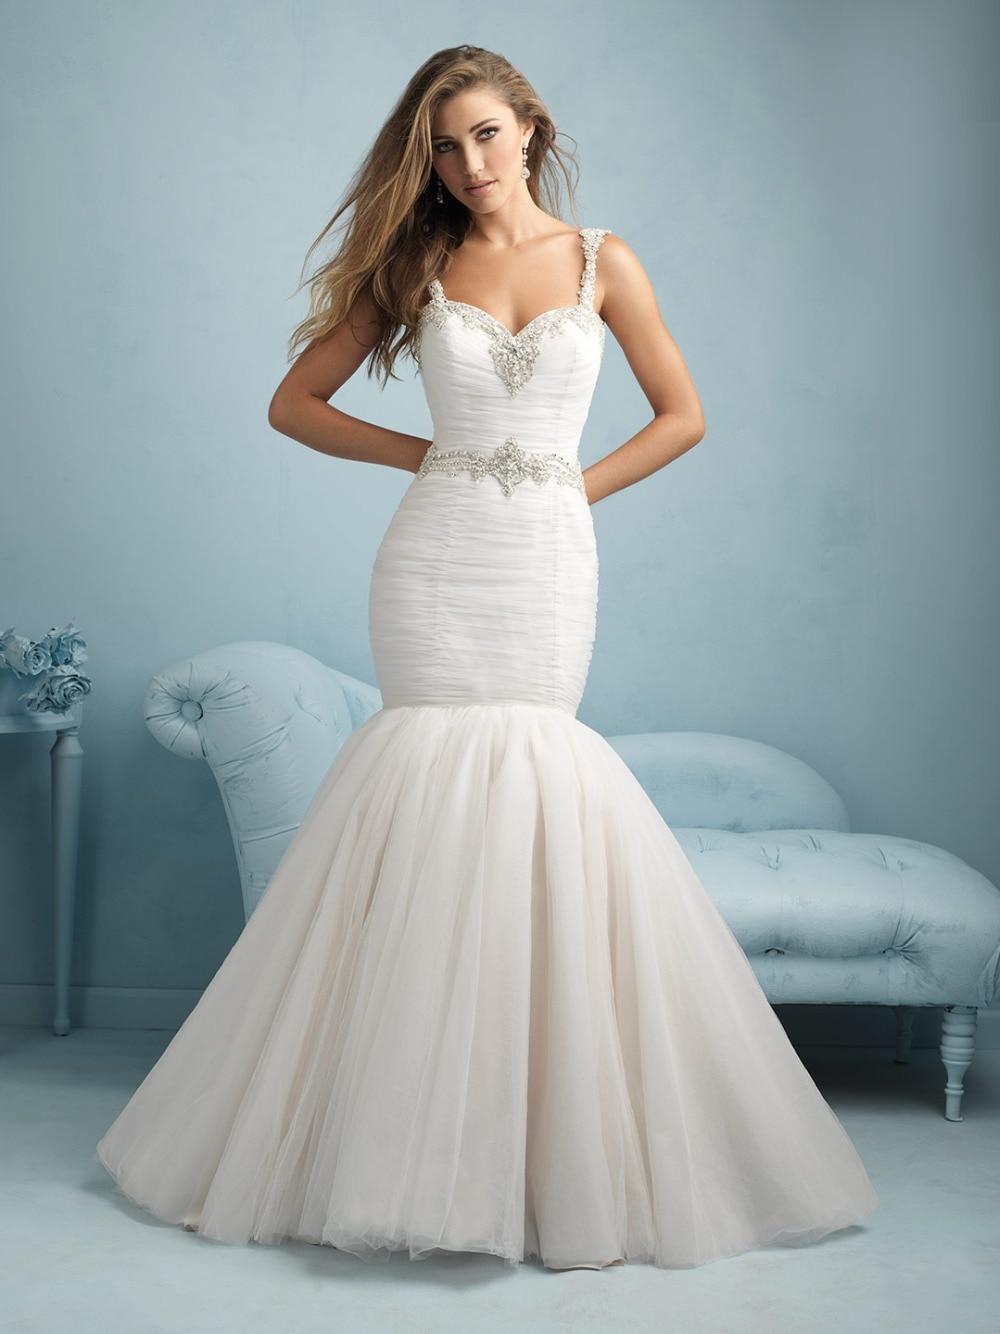 Luxury Cream Colored Prom Dress Crest - Wedding Dress Ideas ...